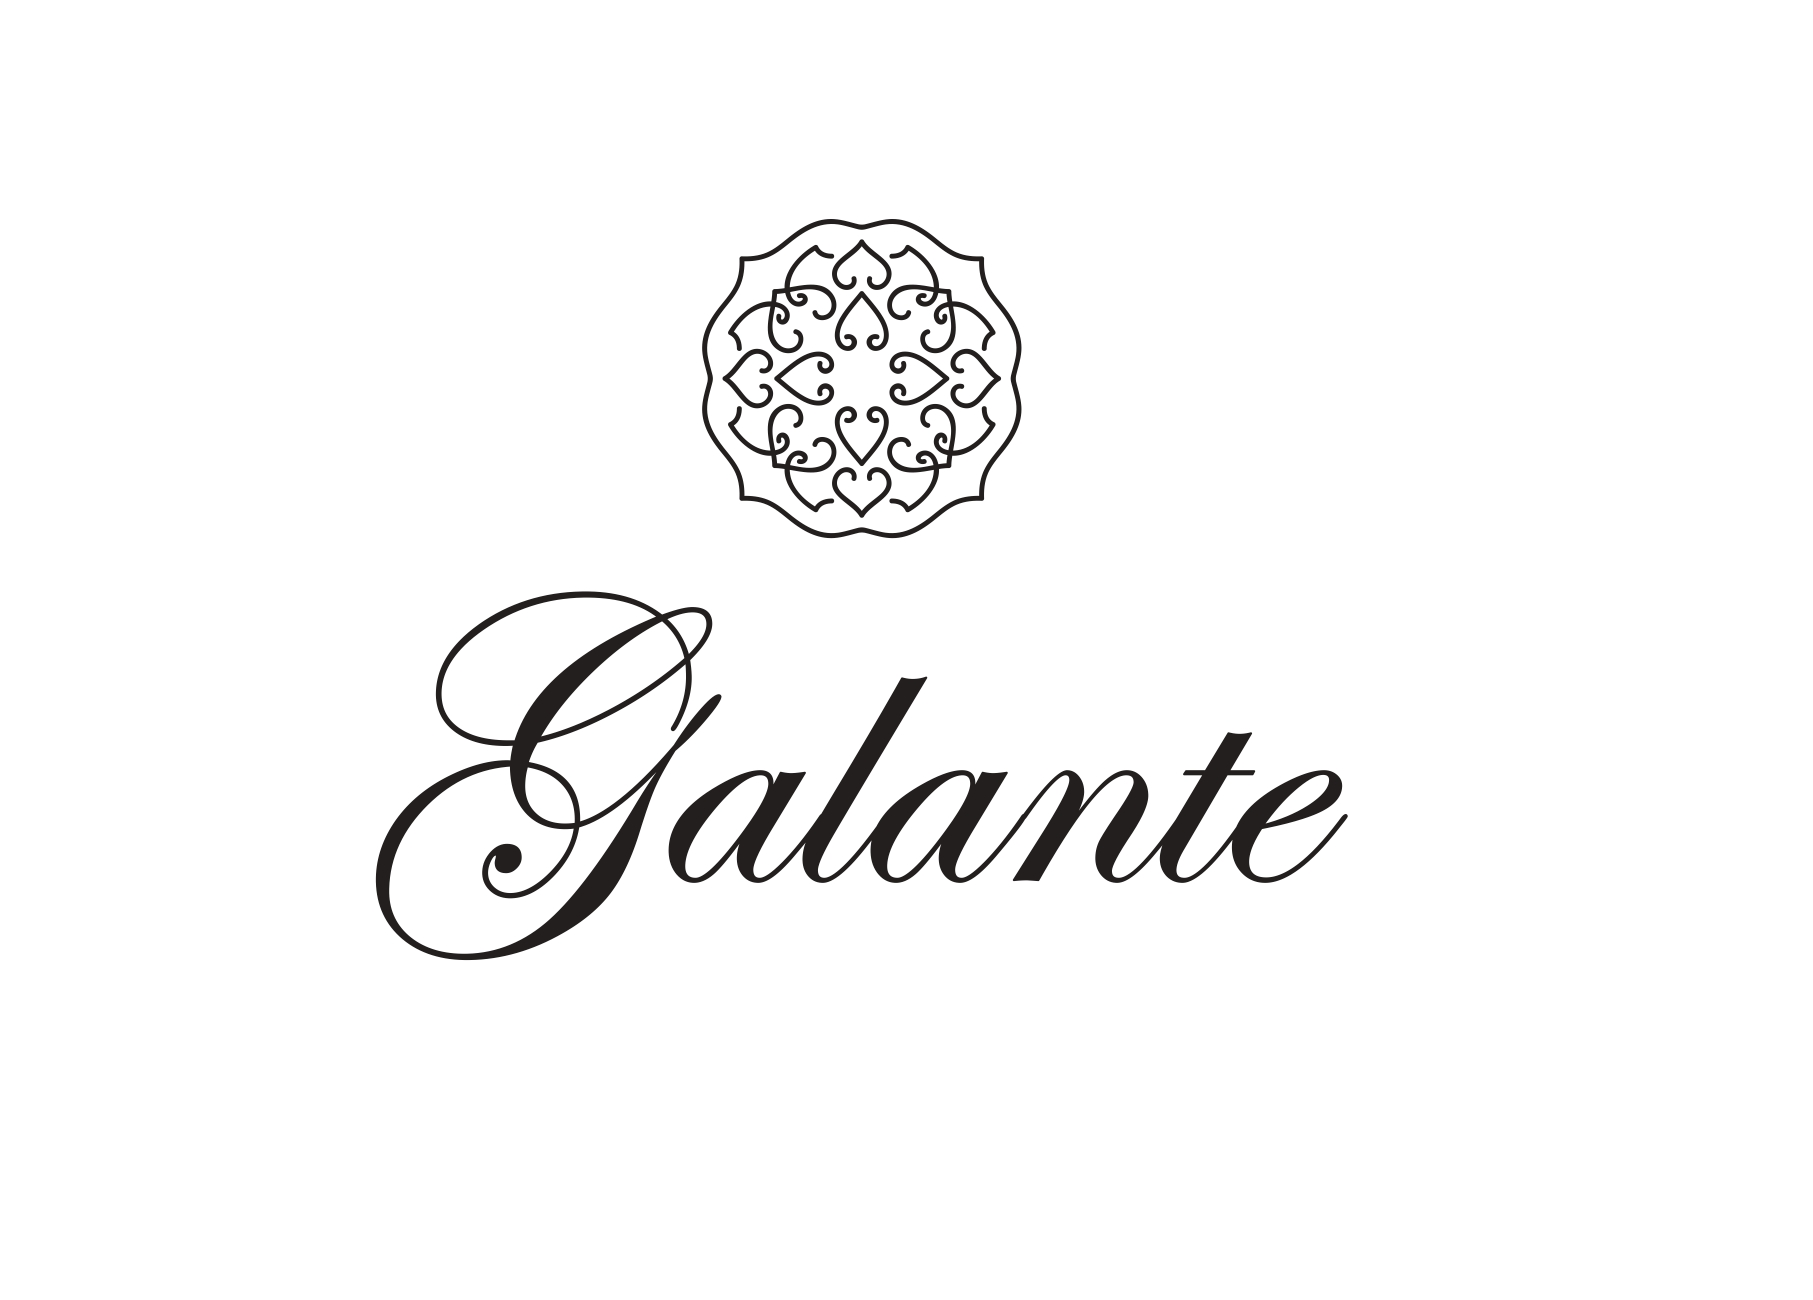 Galante_page-0001